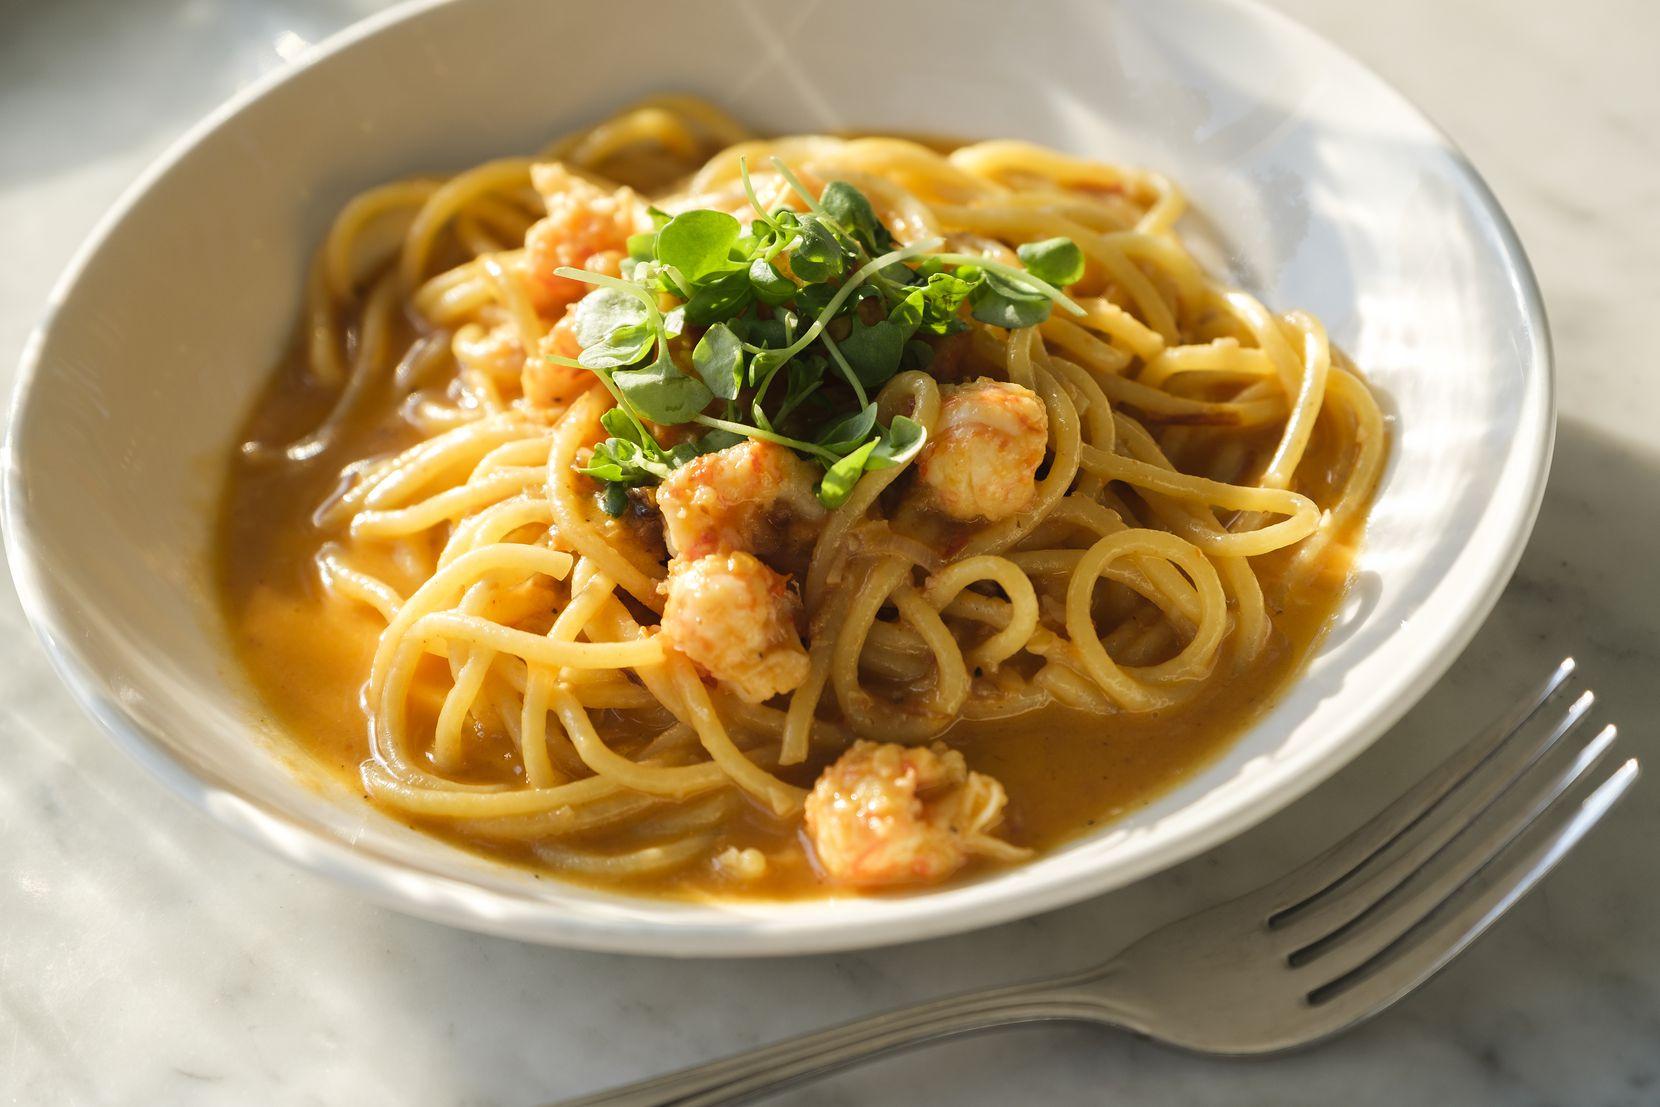 Chef Tim Love's Italian restaurant in Fort Worth, Gemelle, is participating in DFW Restaurant Week.